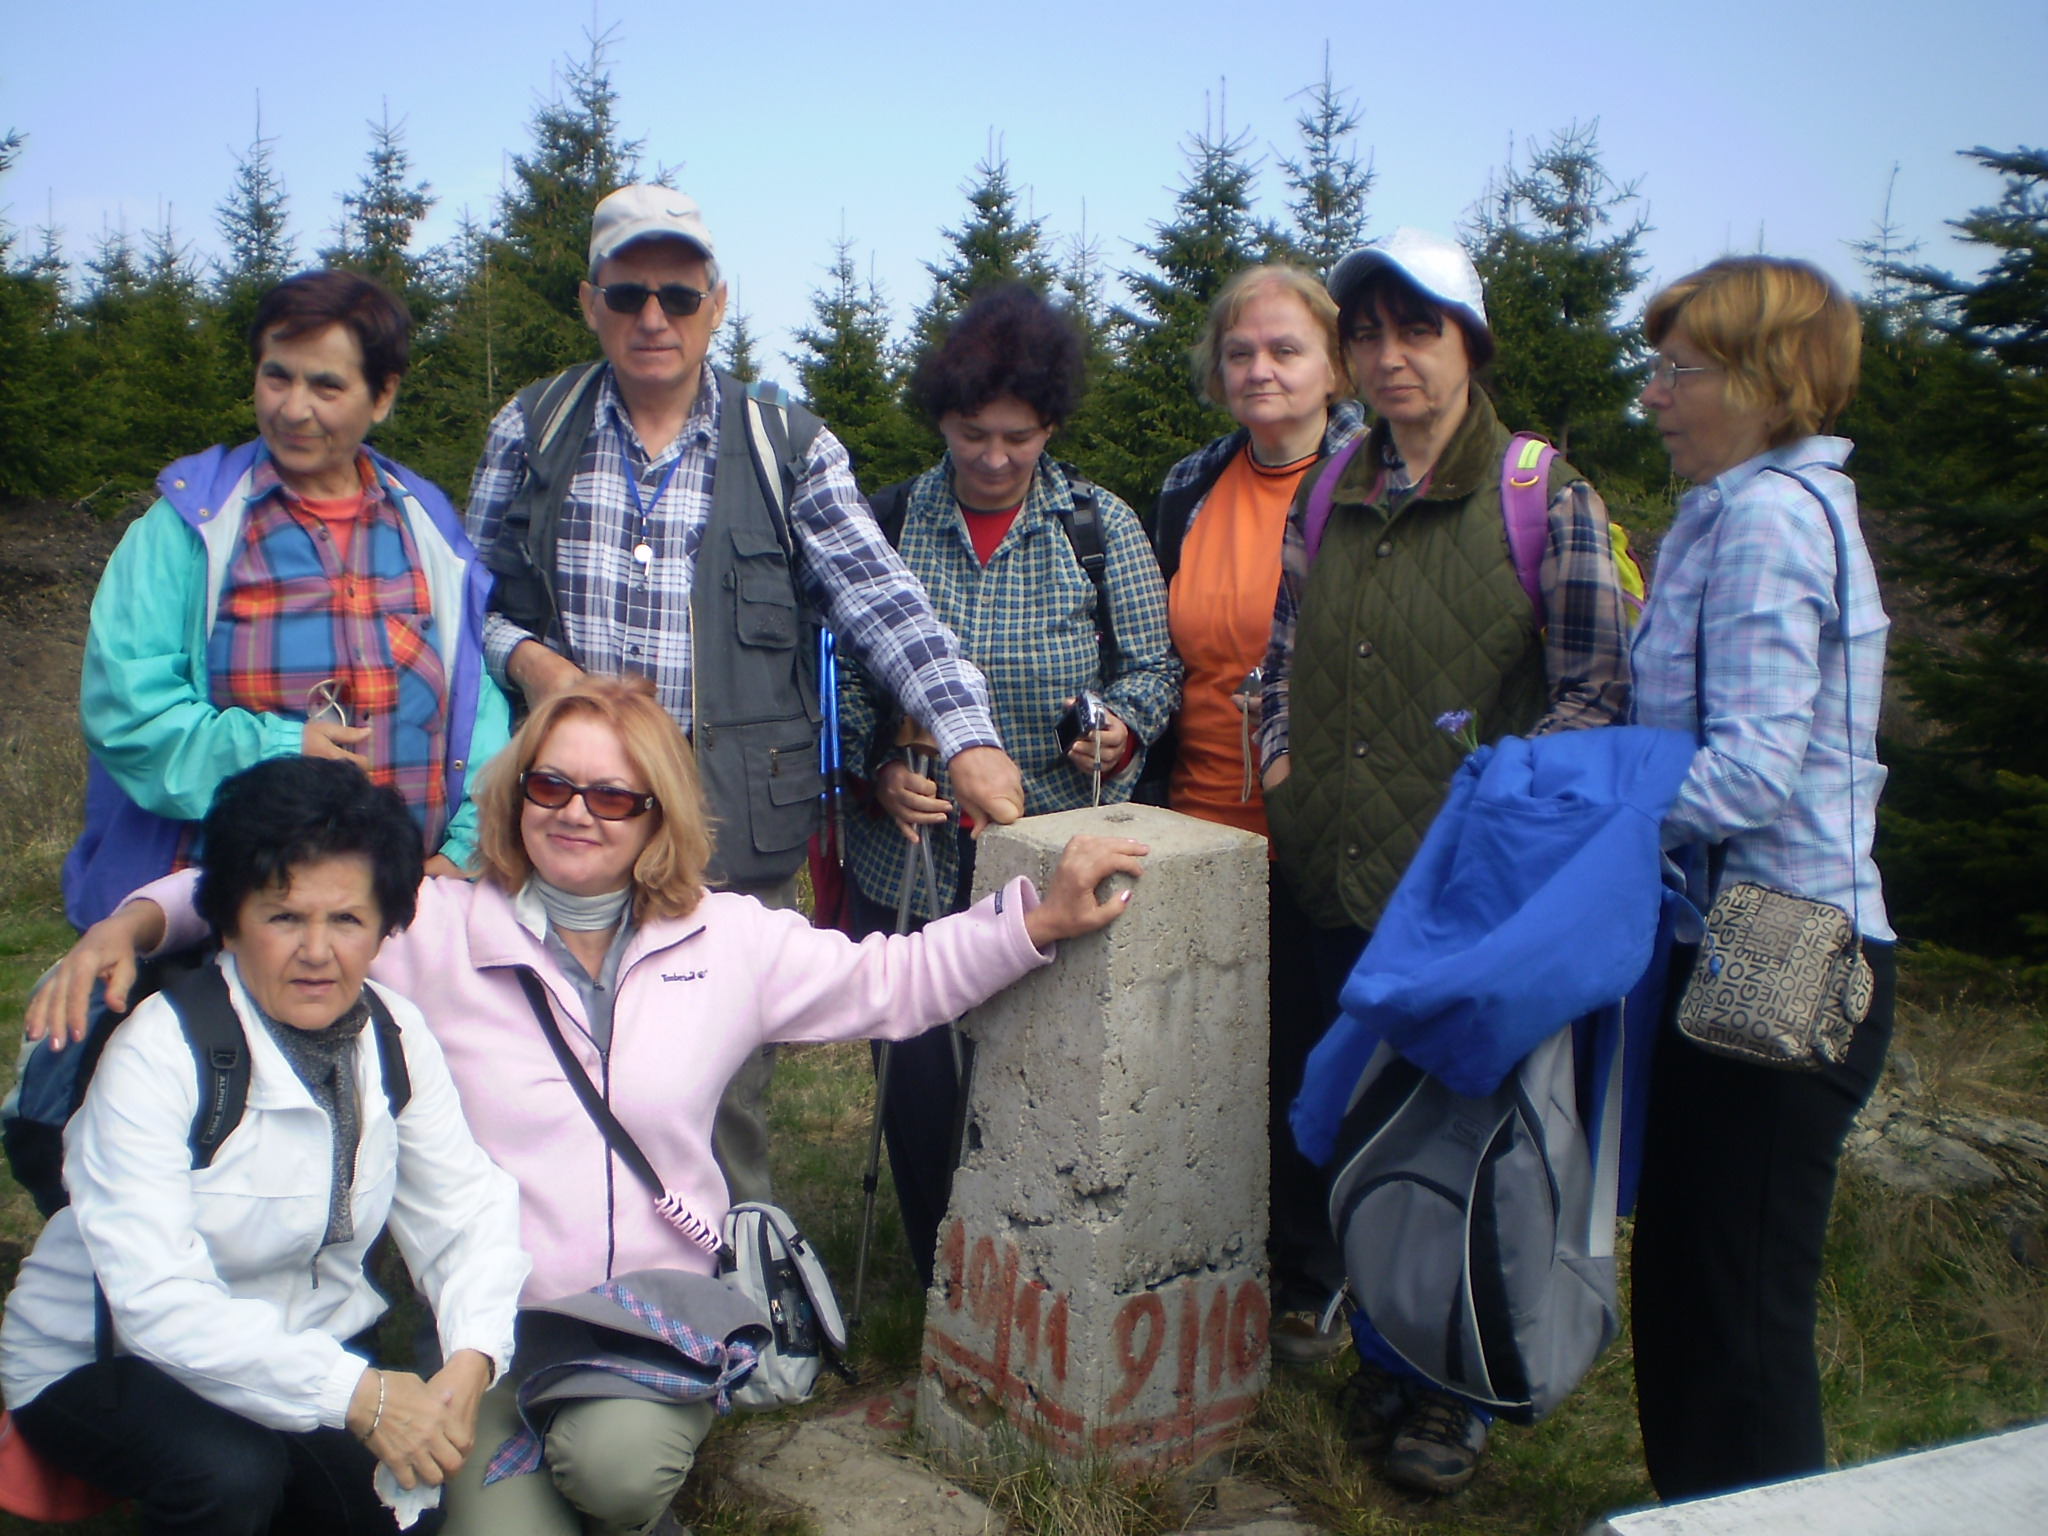 20090503033_Vlasina.JPG - 774,88 kB